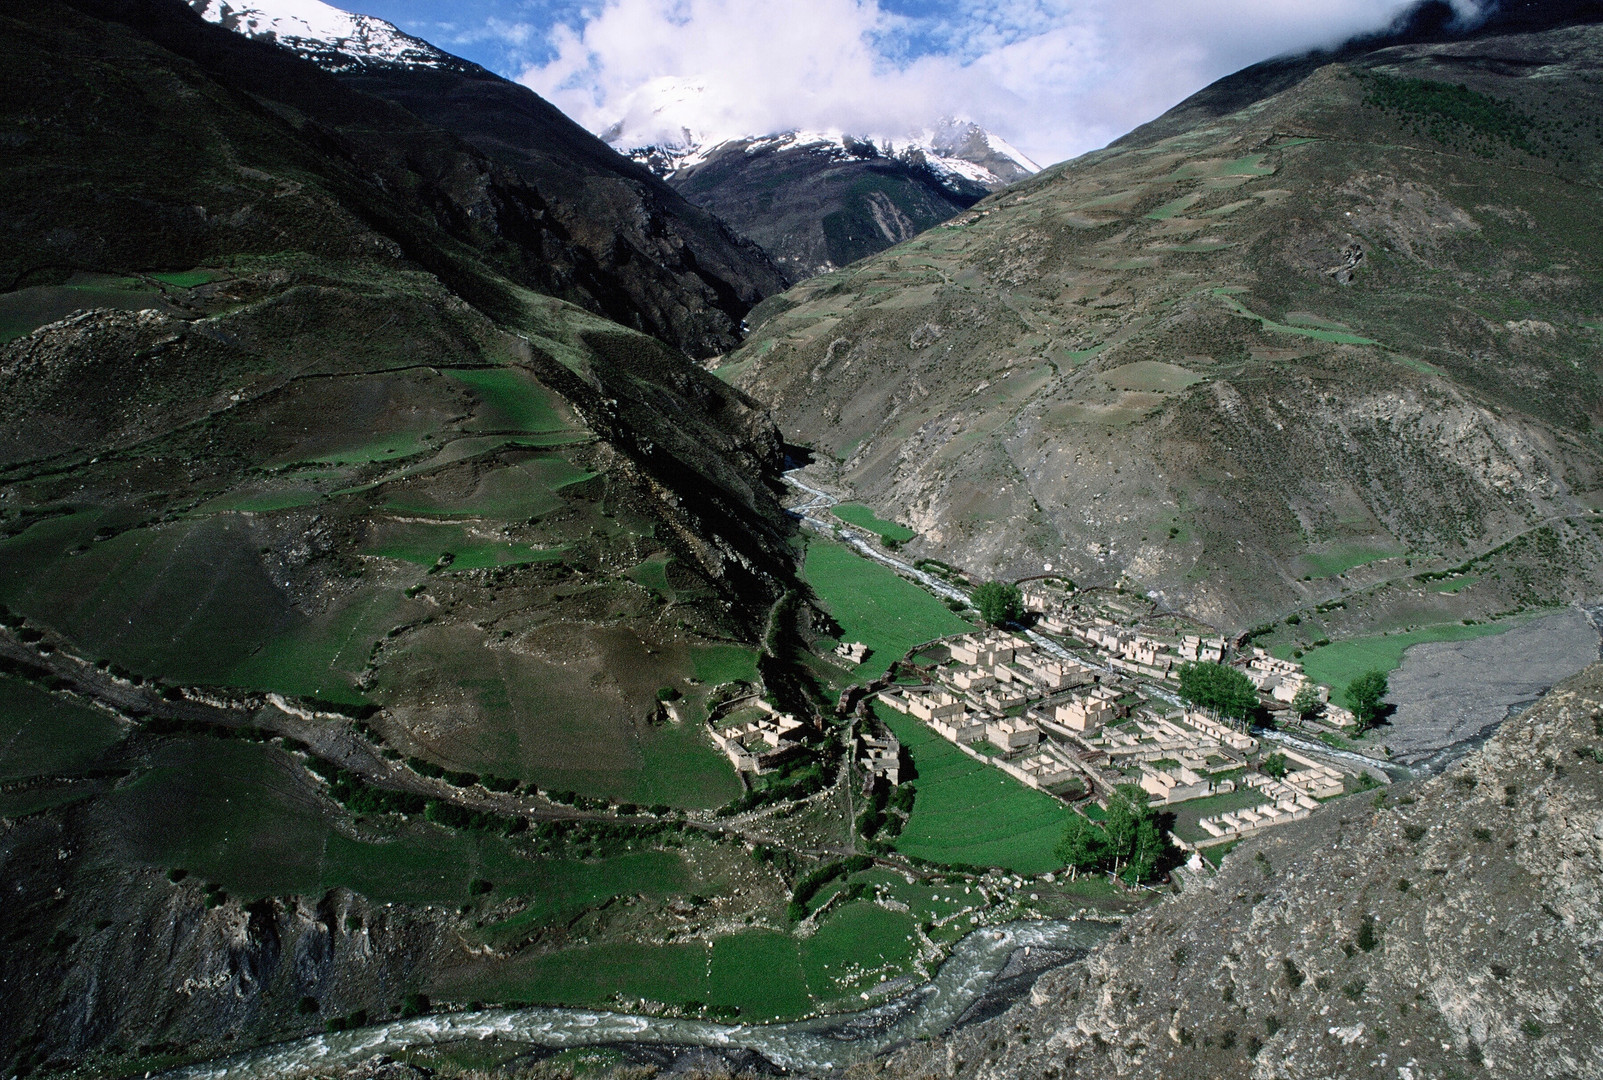 Abadoned - Tenda, Tibet